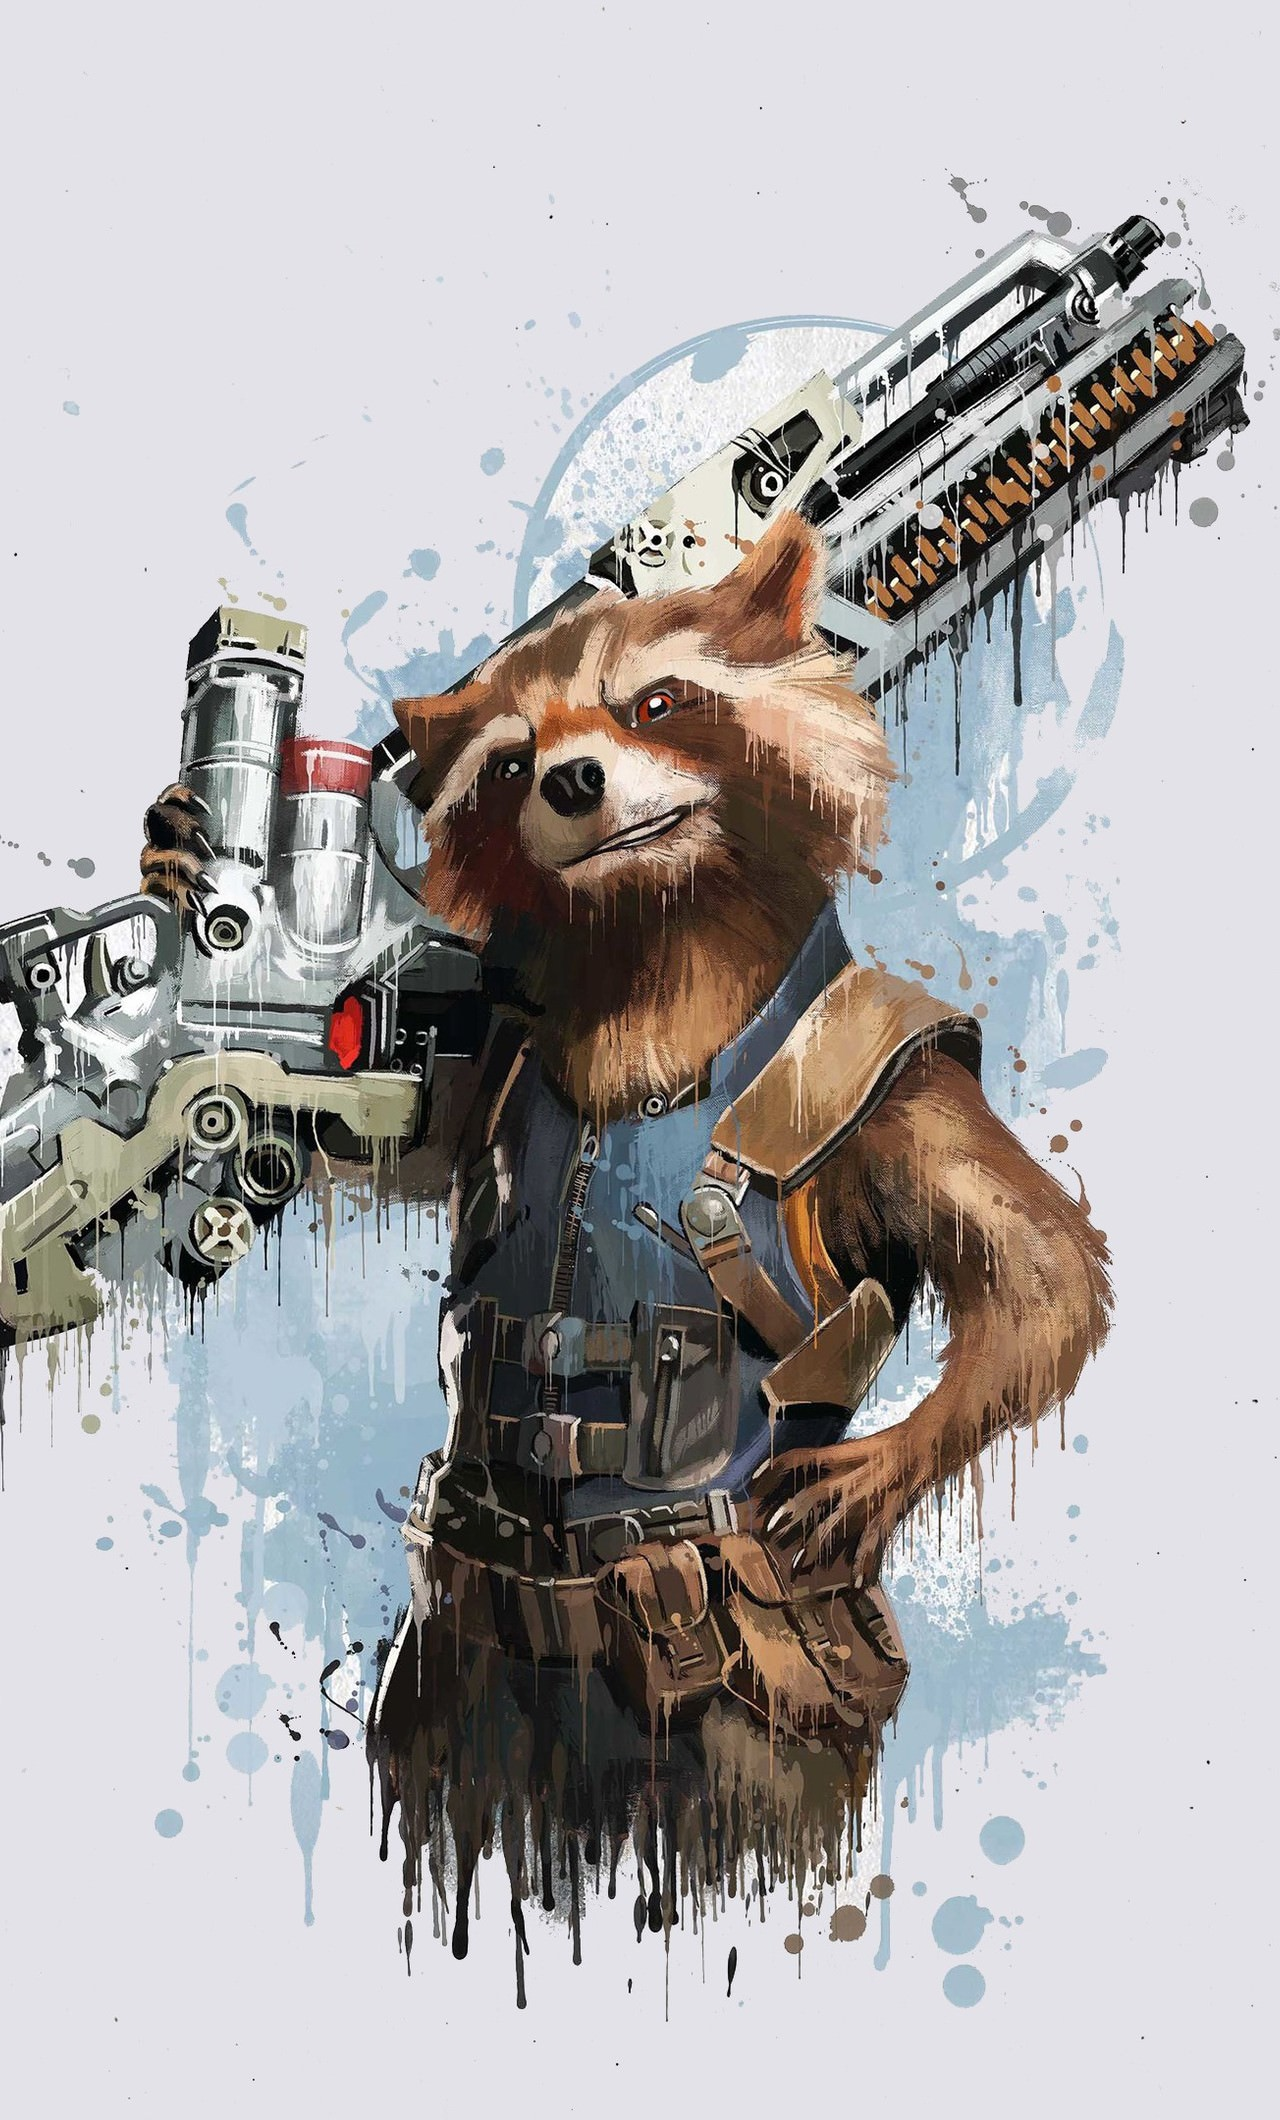 marvel rocket raccoon gun animal weapon illustration mammal art